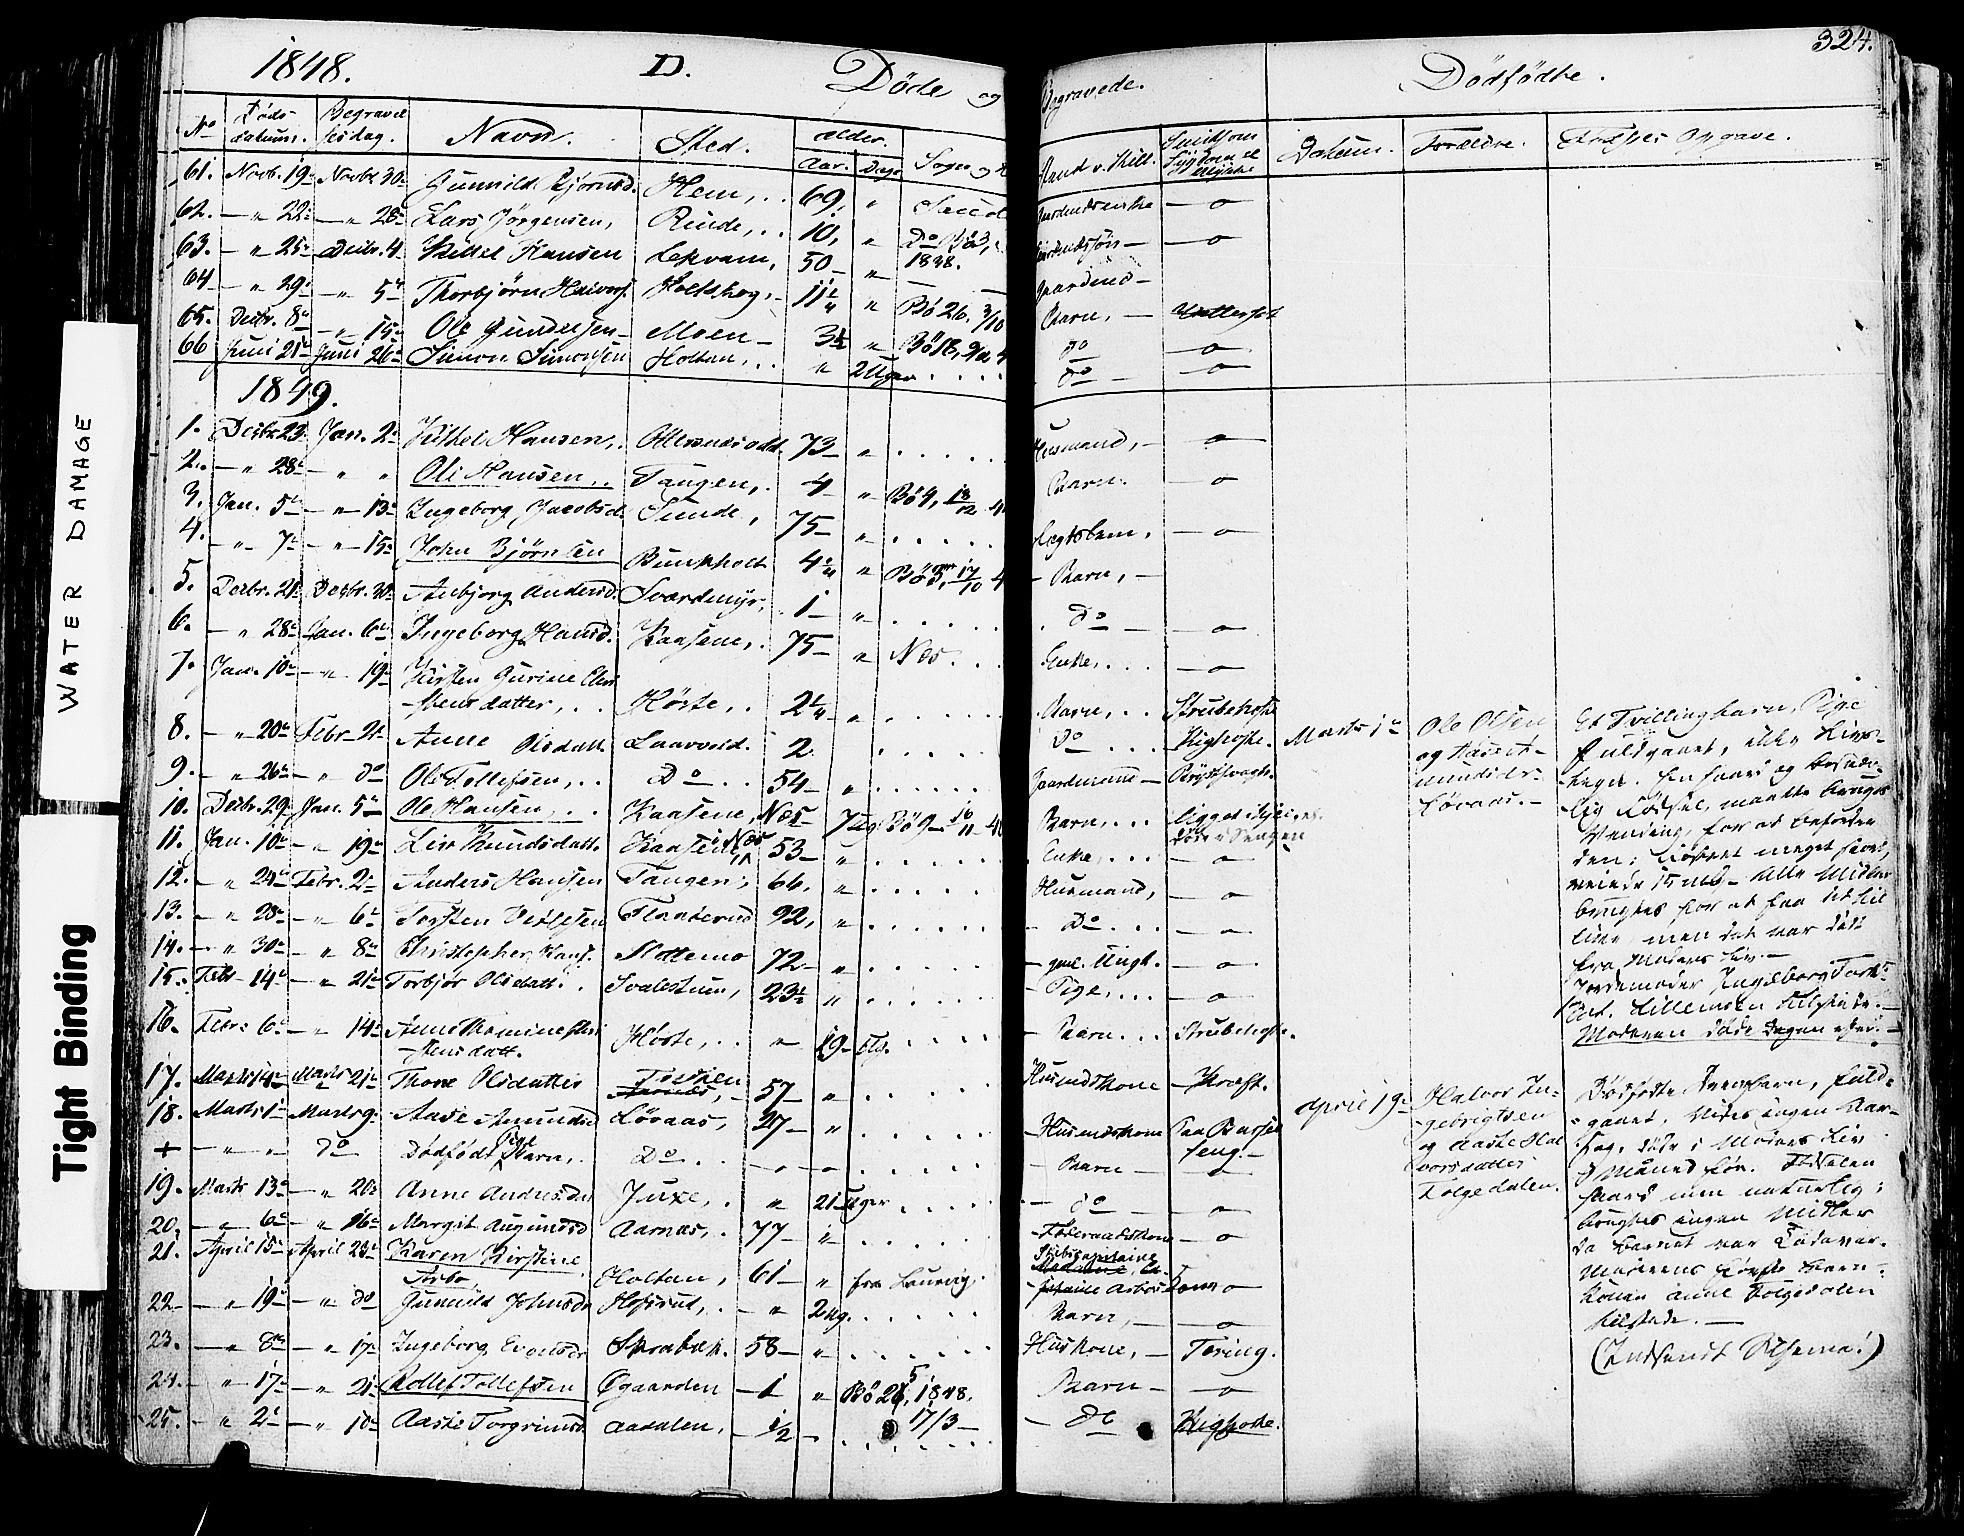 SAKO, Sauherad kirkebøker, F/Fa/L0006: Ministerialbok nr. I 6, 1827-1850, s. 324